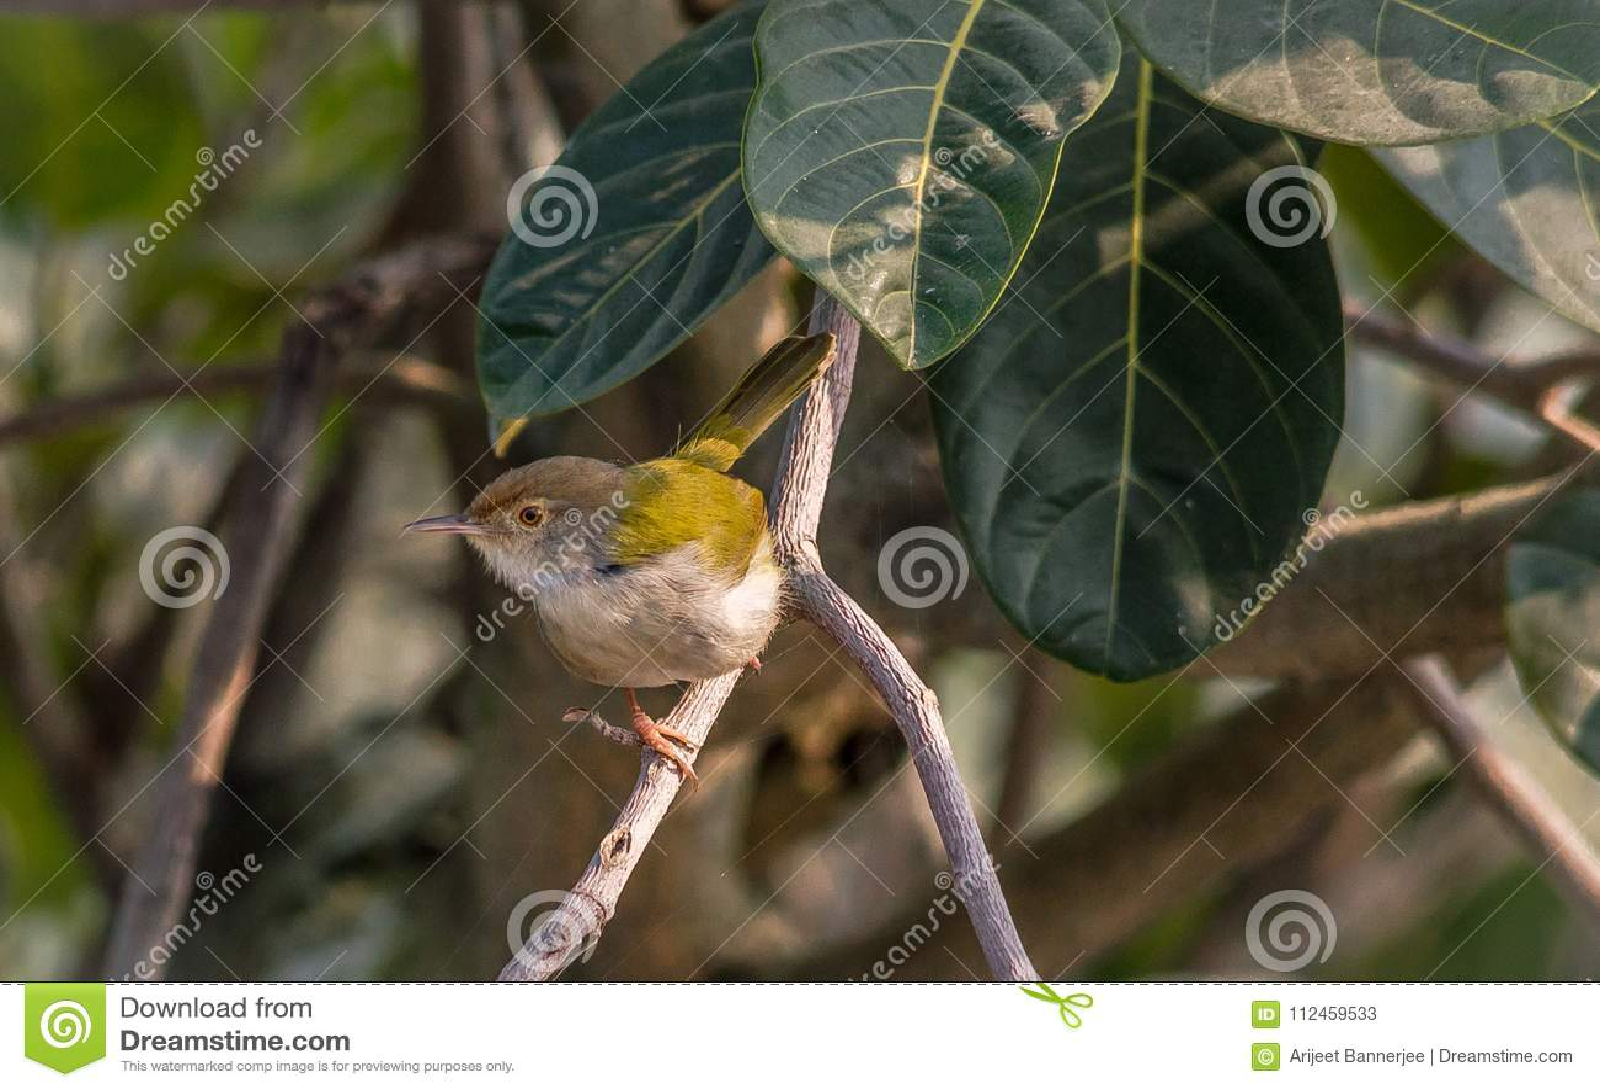 A common tailor bird sitting on tree branch